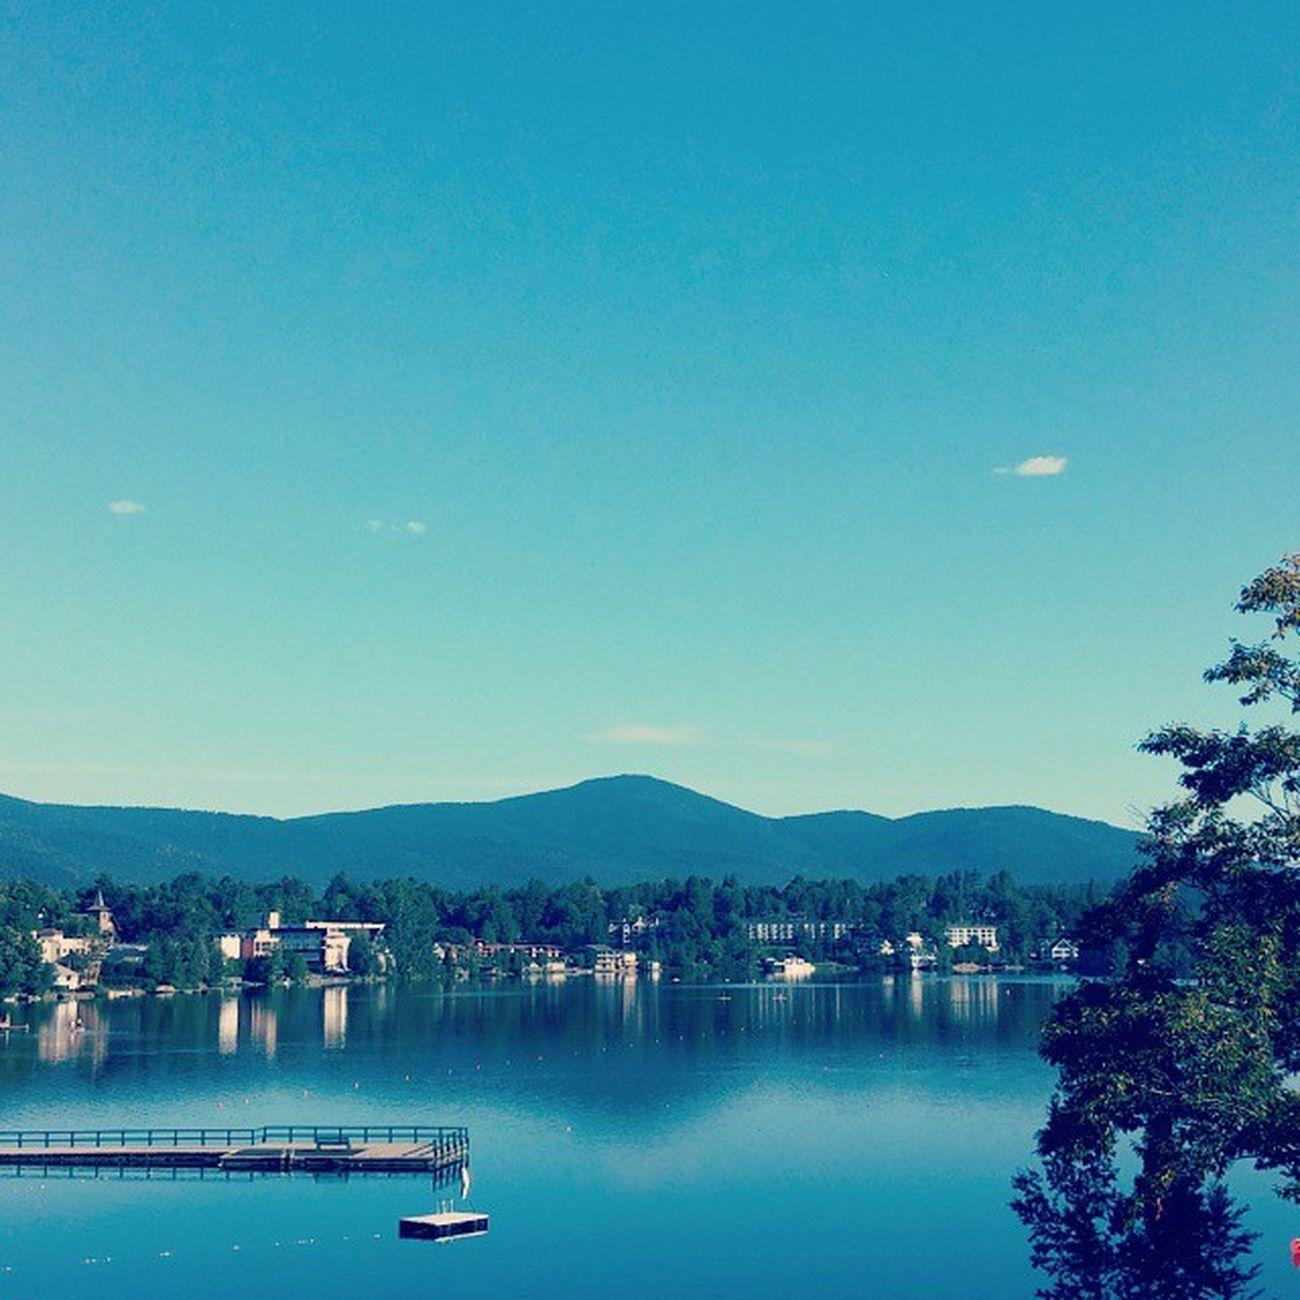 Gonna miss this view Lakeplacid ADK Mirrorlake Photooftheday POTD Landscape